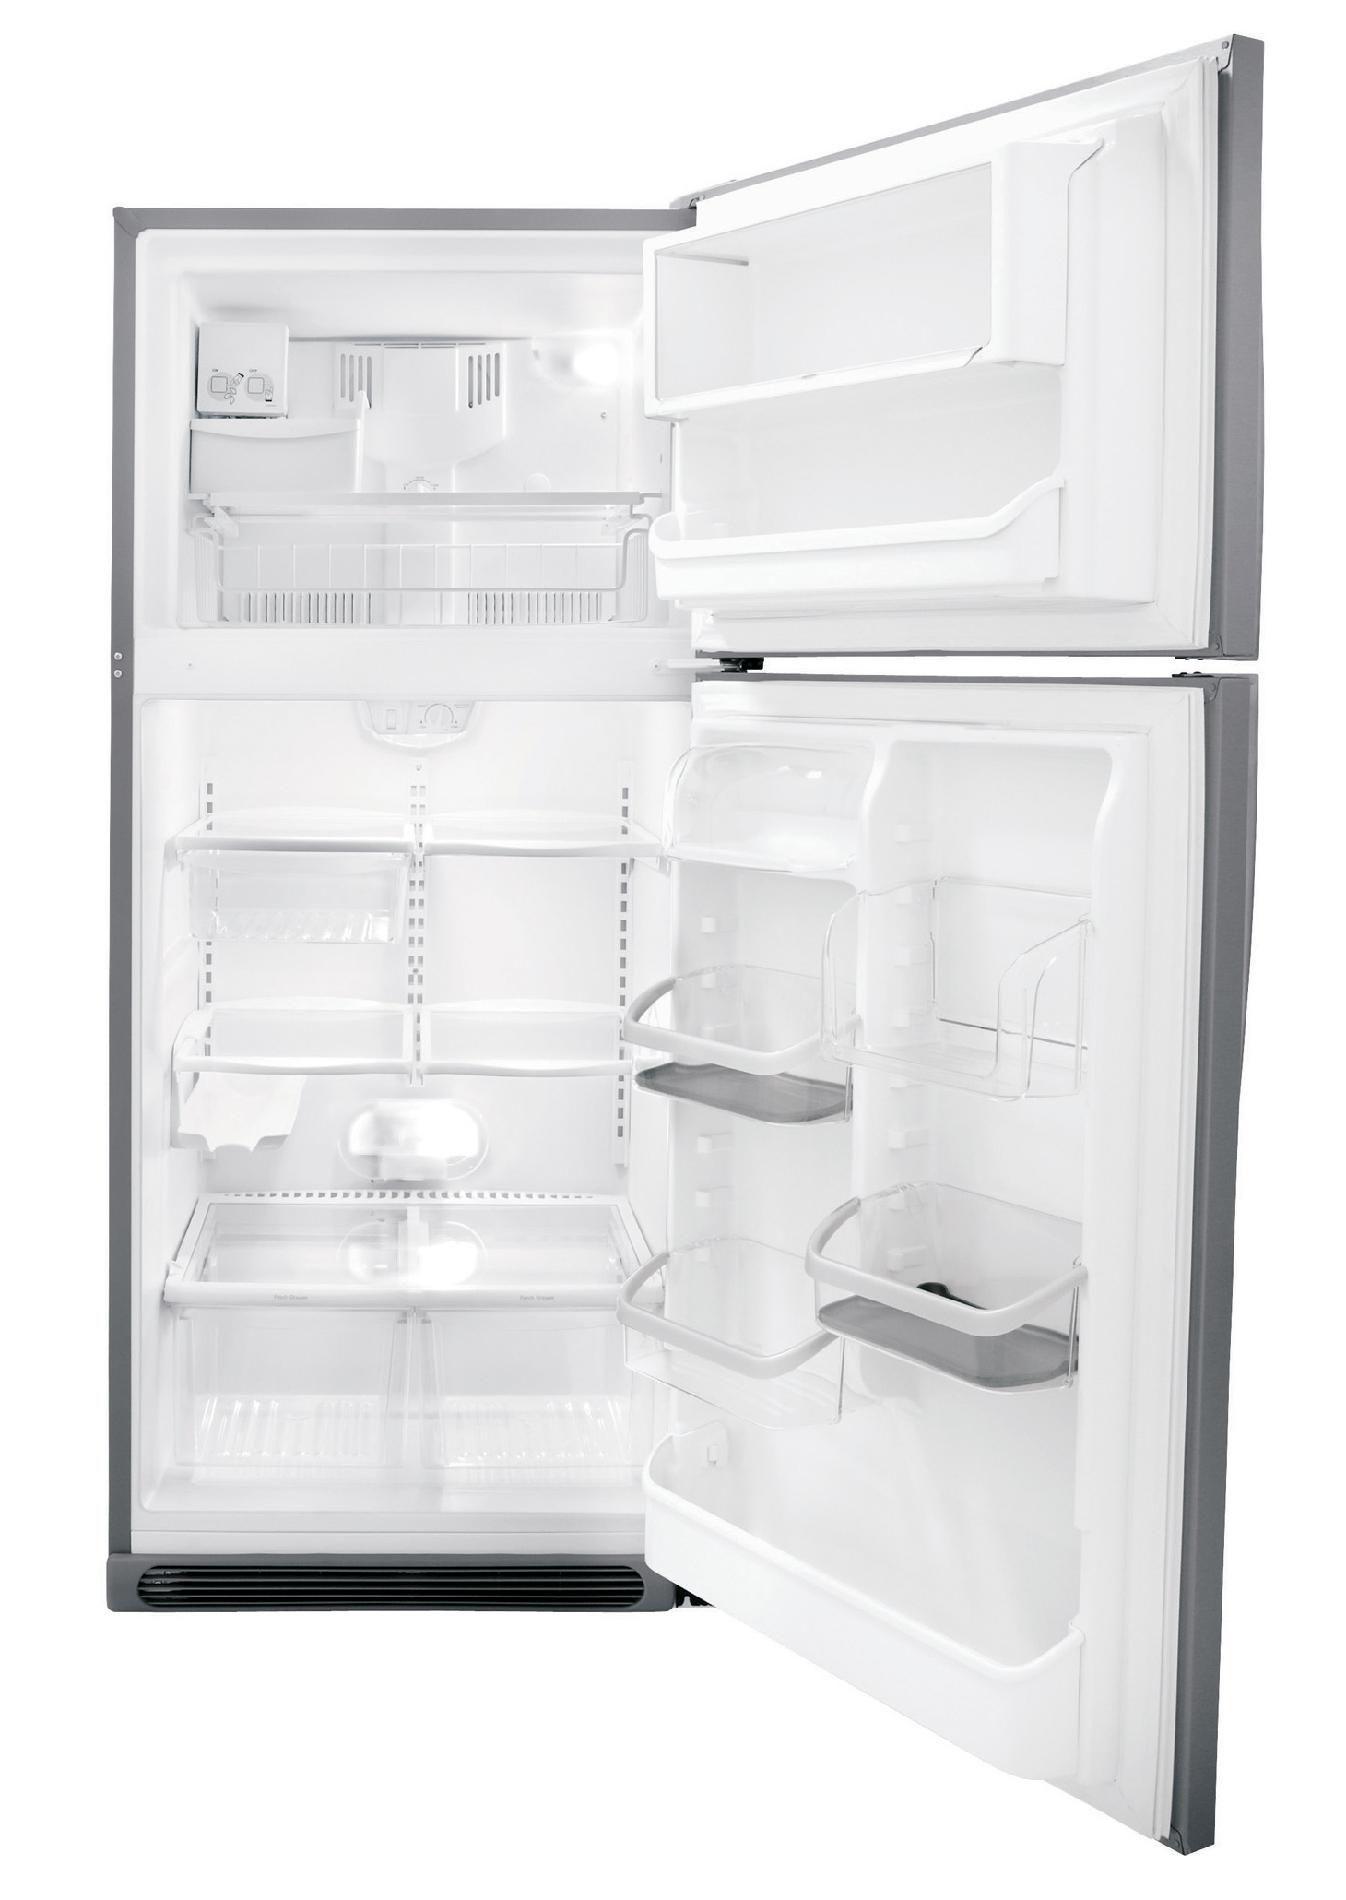 Frigidaire 20.6 cu. ft. Top Freezer Refrigerator - Stainless Steel